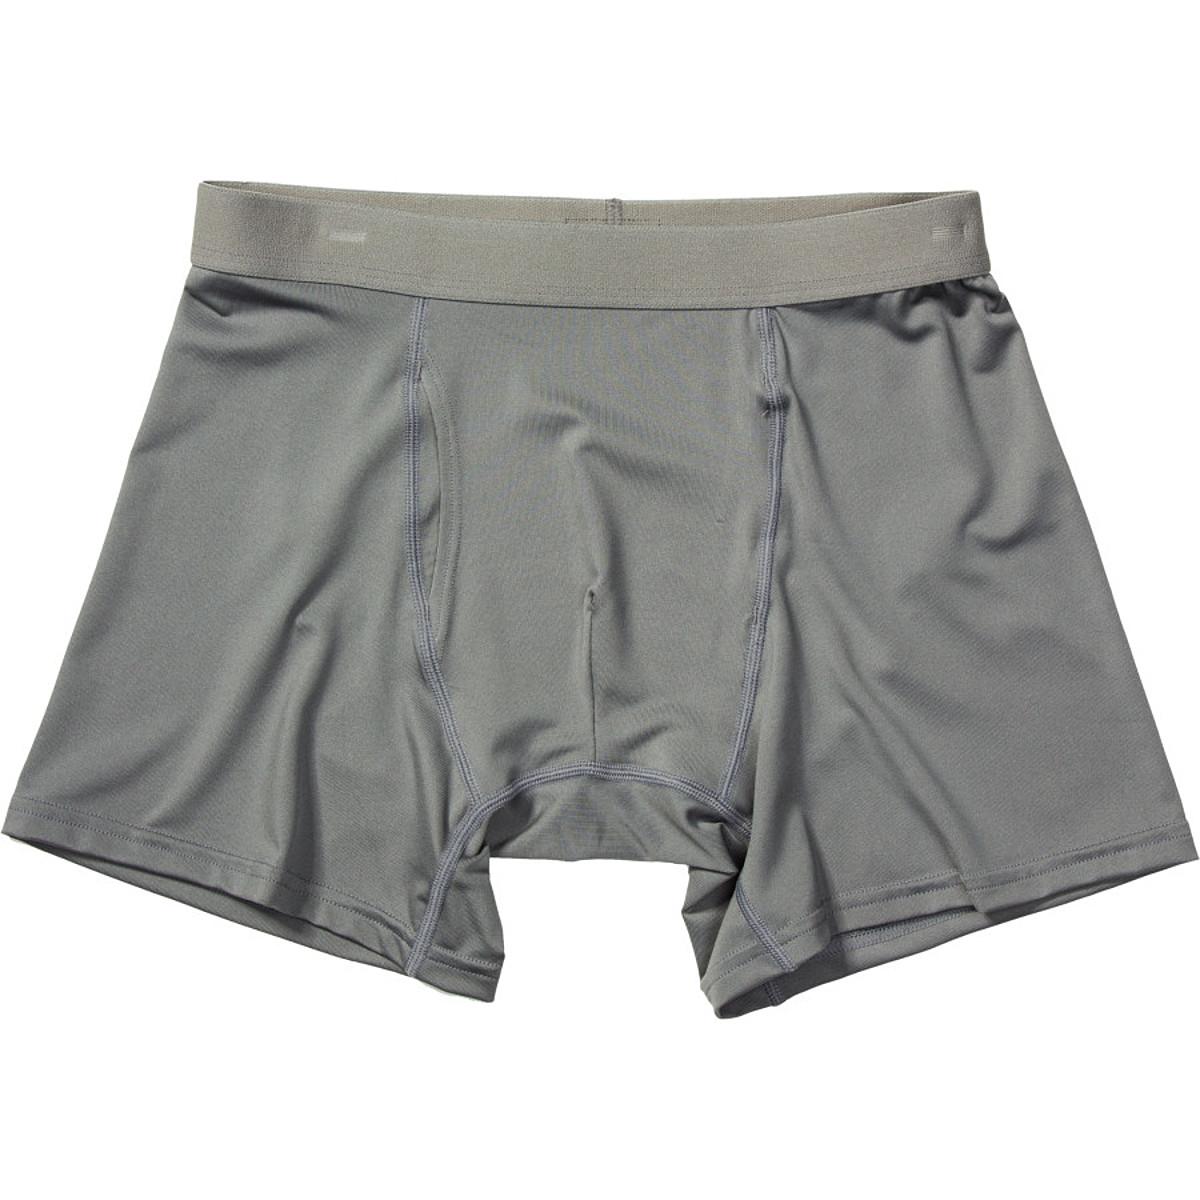 photo: Patagonia Capilene 1 Stretch Boxer Briefs boxers, briefs, bikini